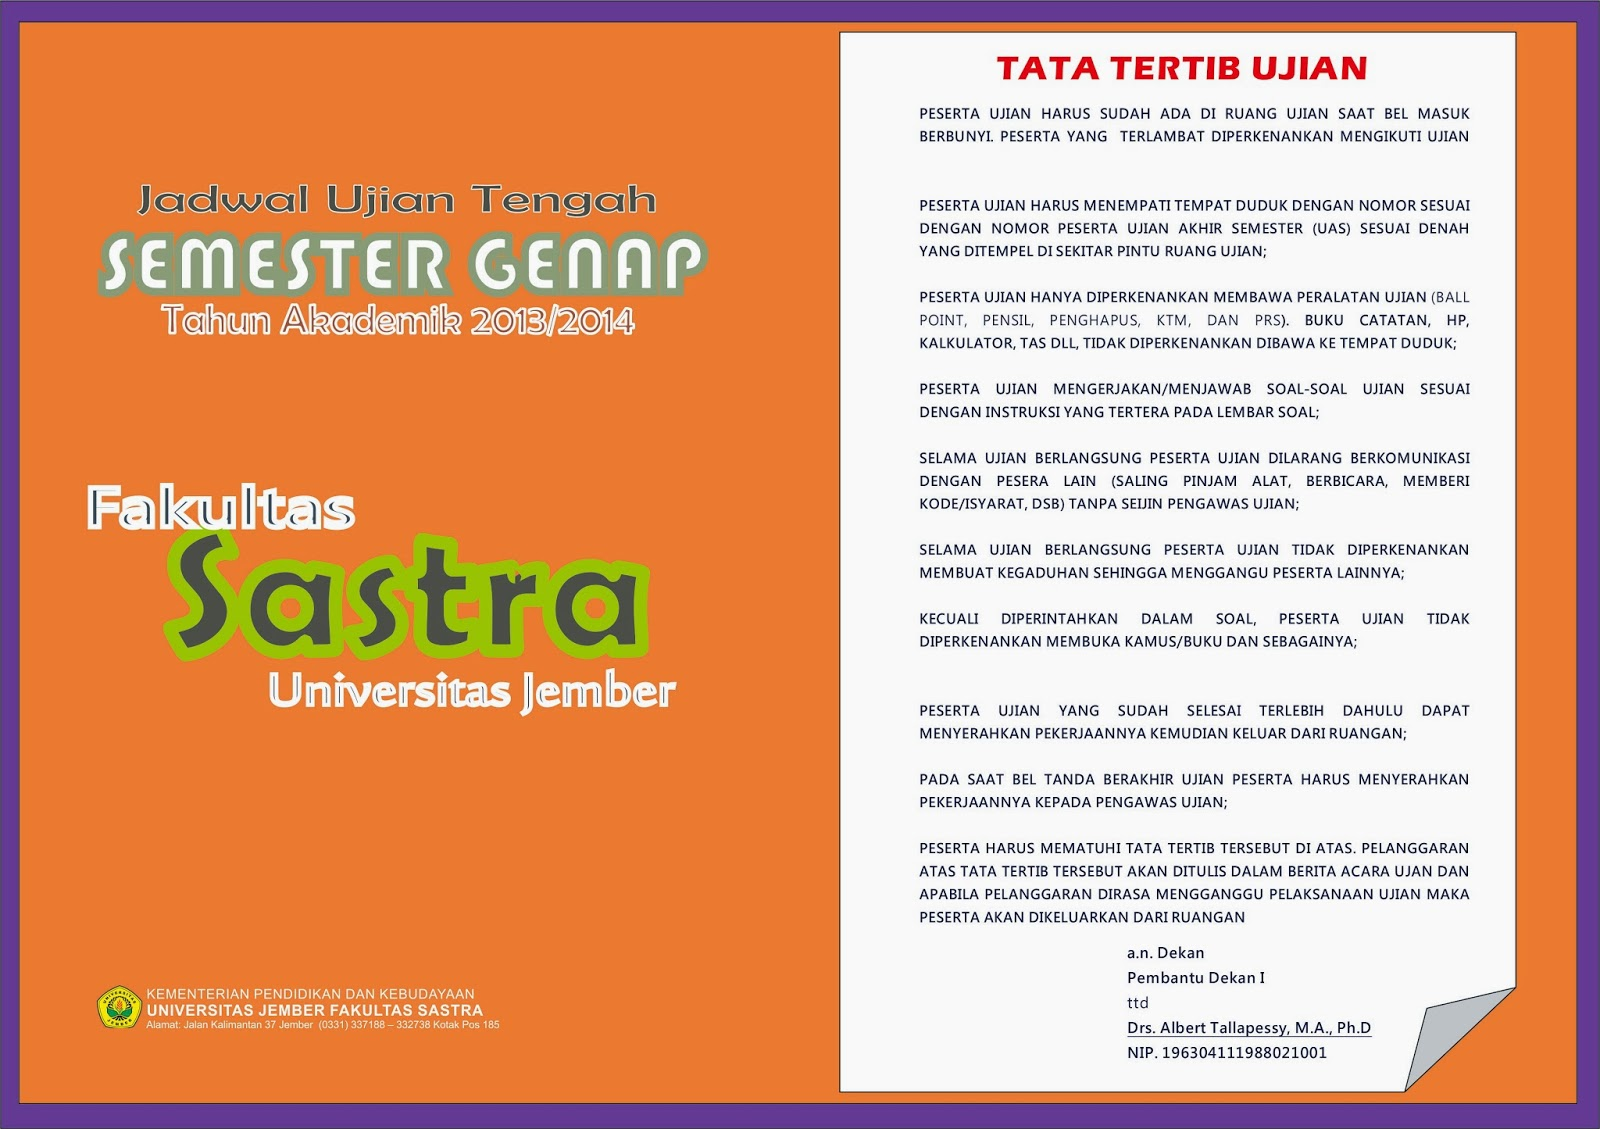 http://www.mediafire.com/view/m6i9rgmara9c6gn/Konsep_Jadwal_UTS_SM_Genap_2013-2014_A.pdf